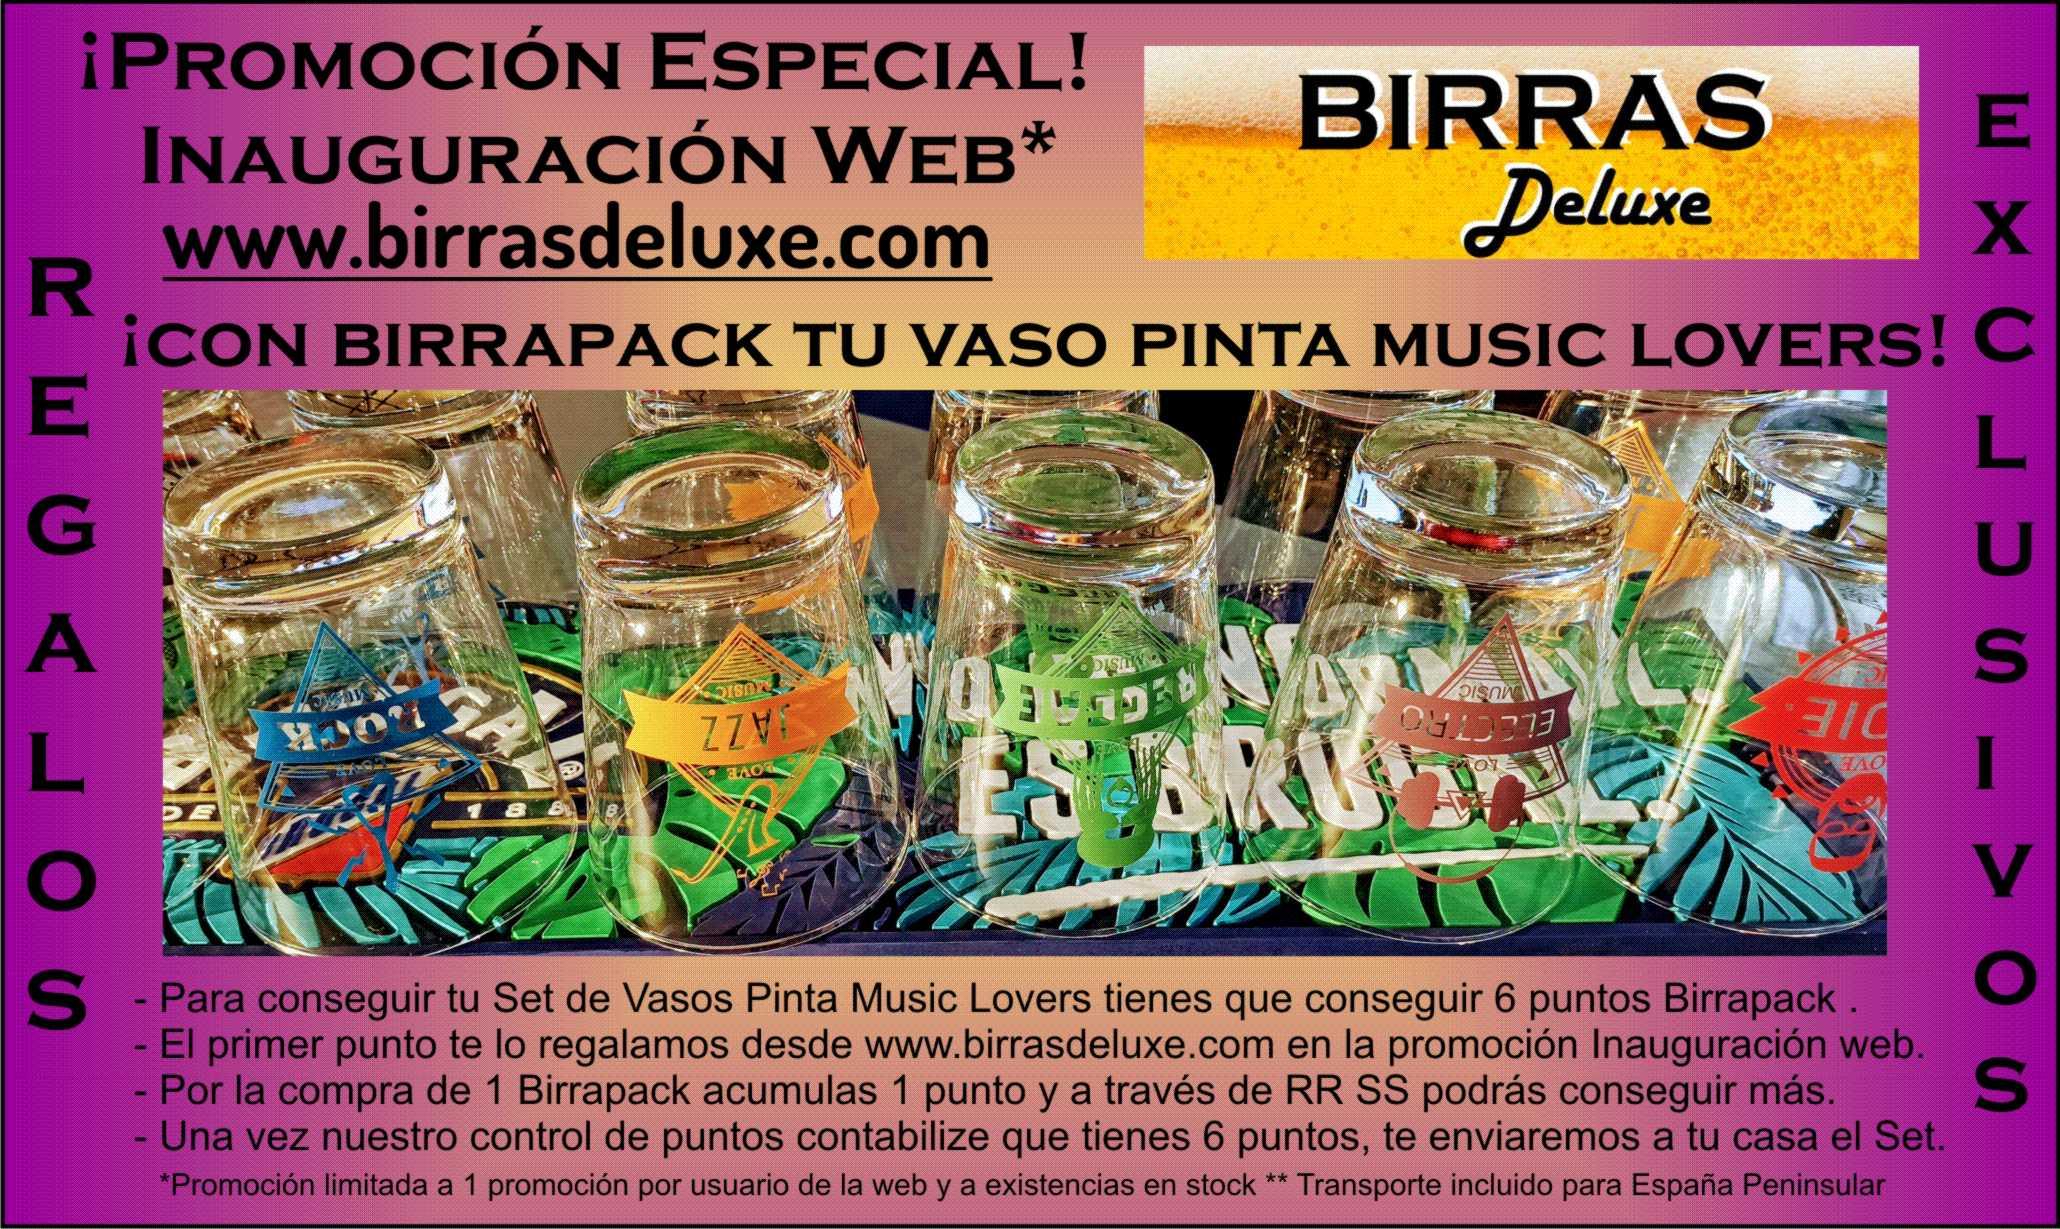 birrapacks-vasos-music-lovers-gratis